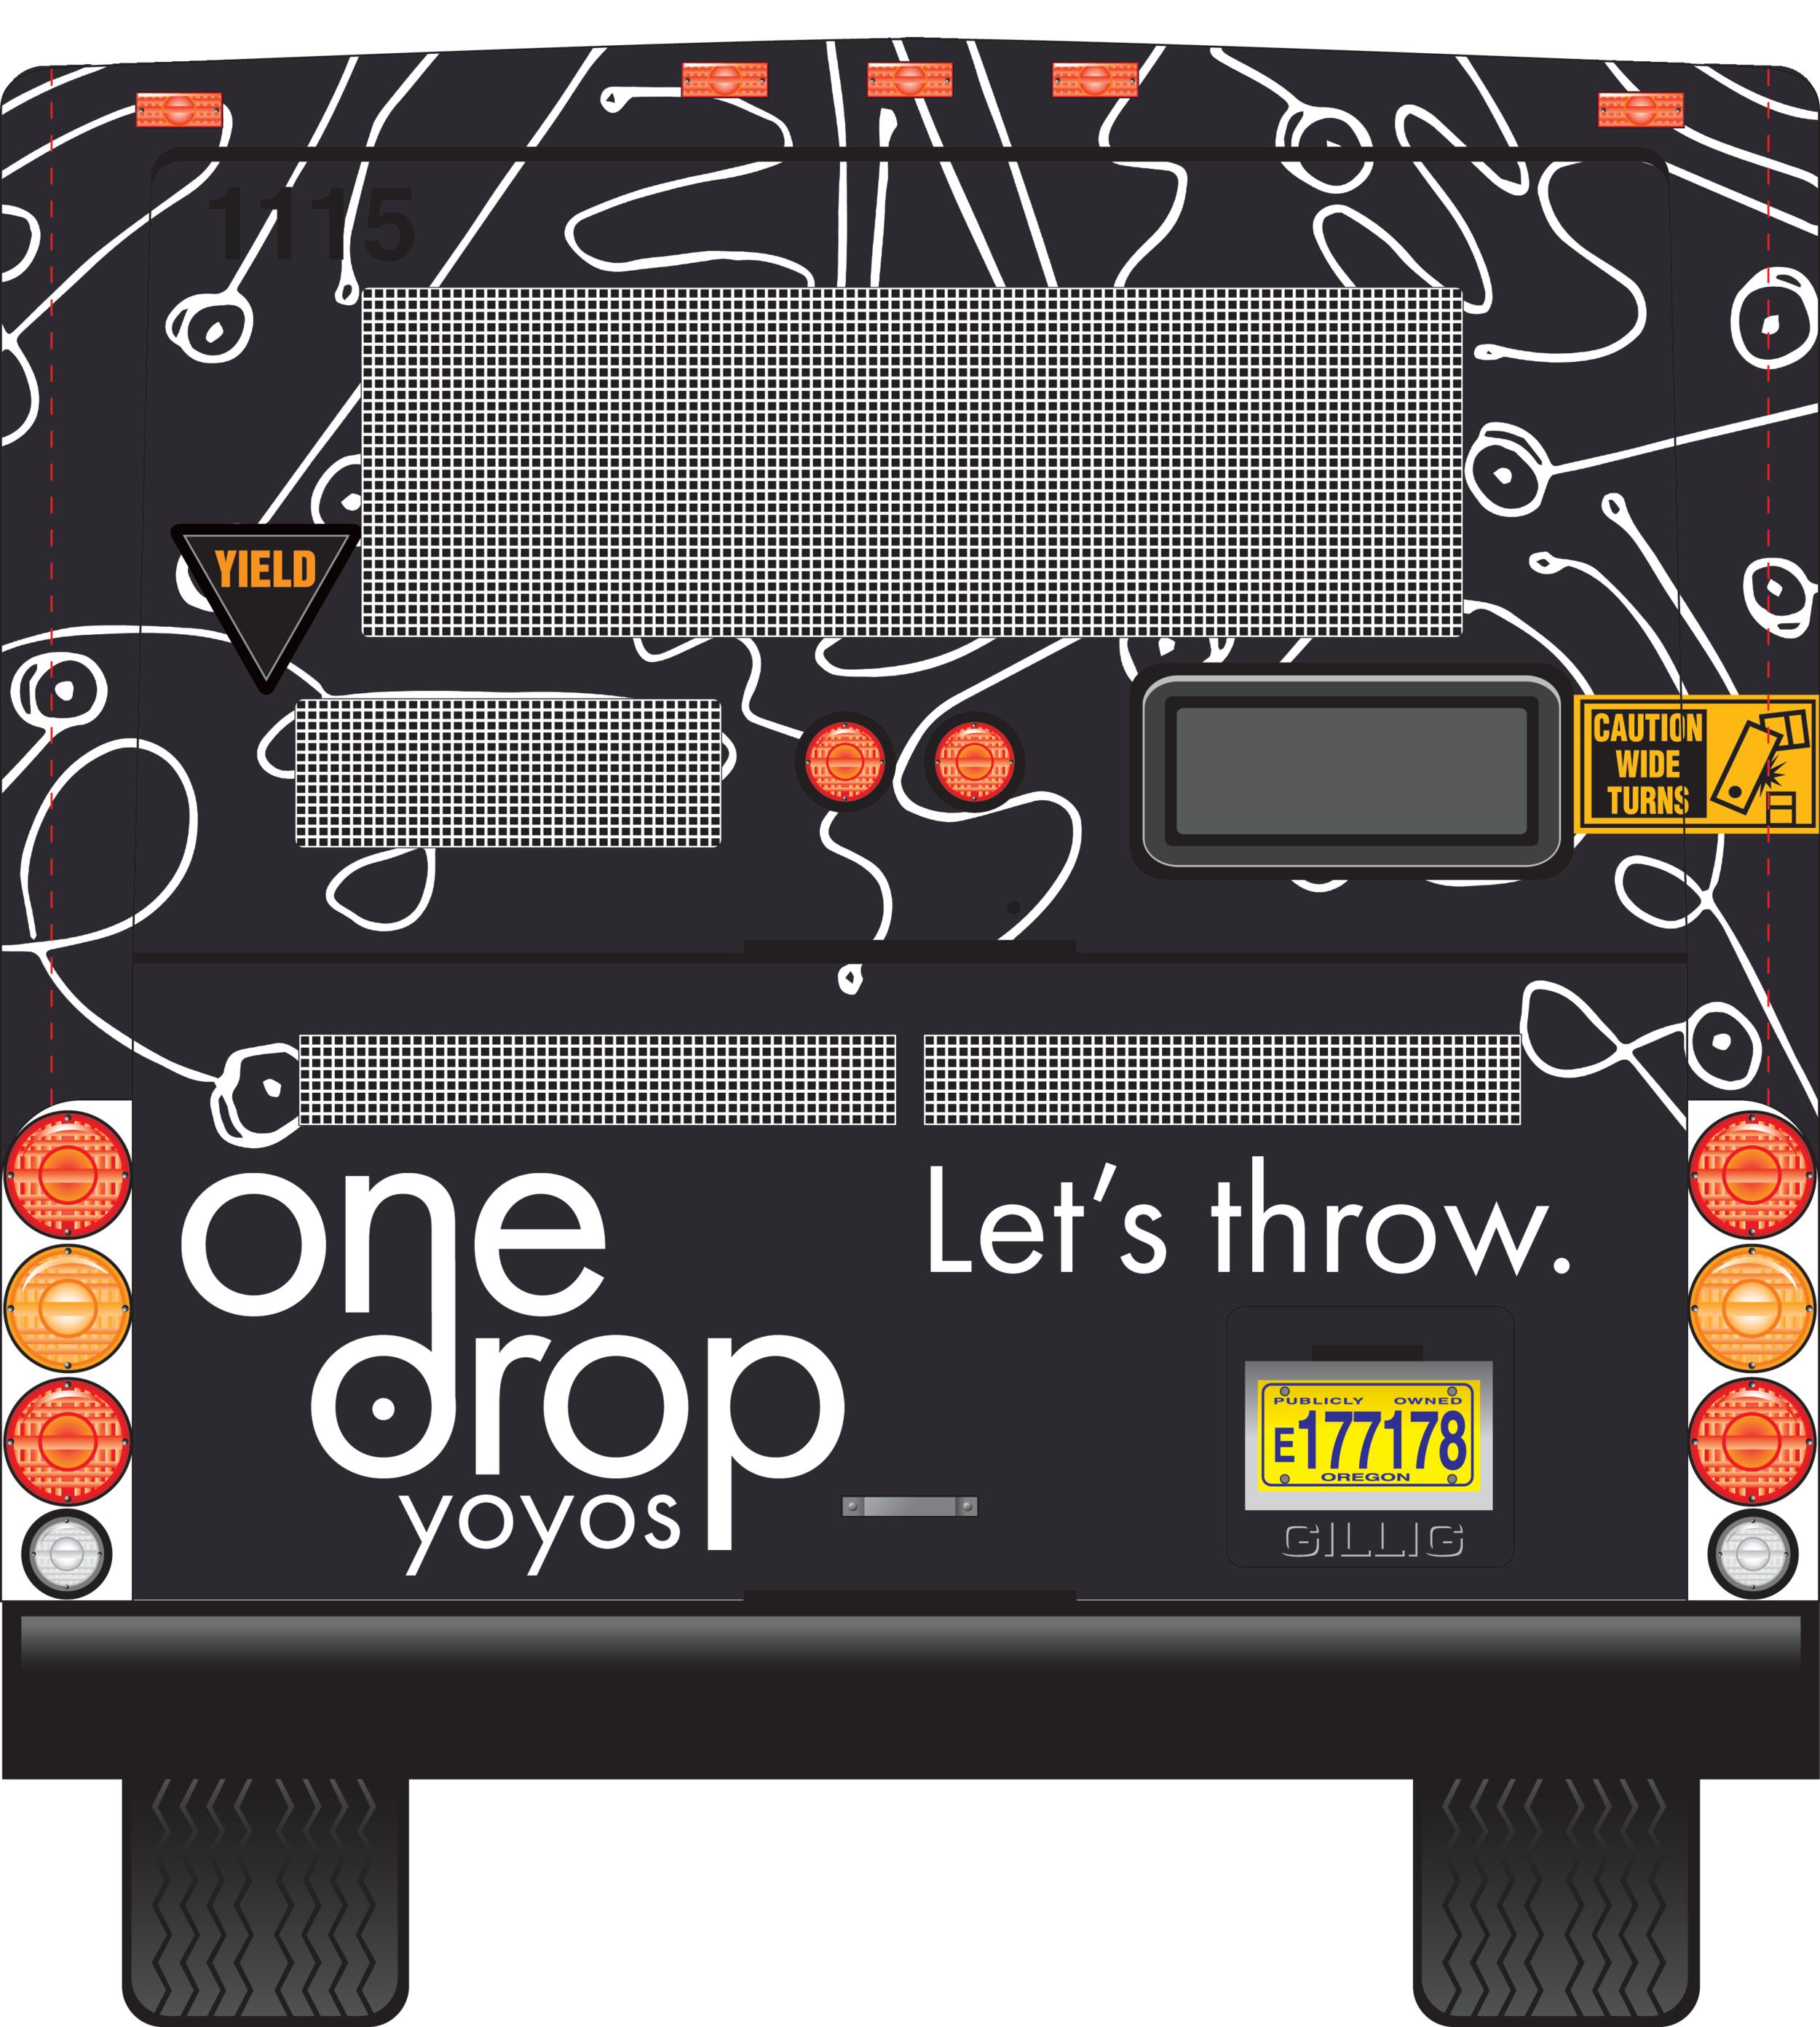 Transit Ads Tail_Bus1_Leonard.png